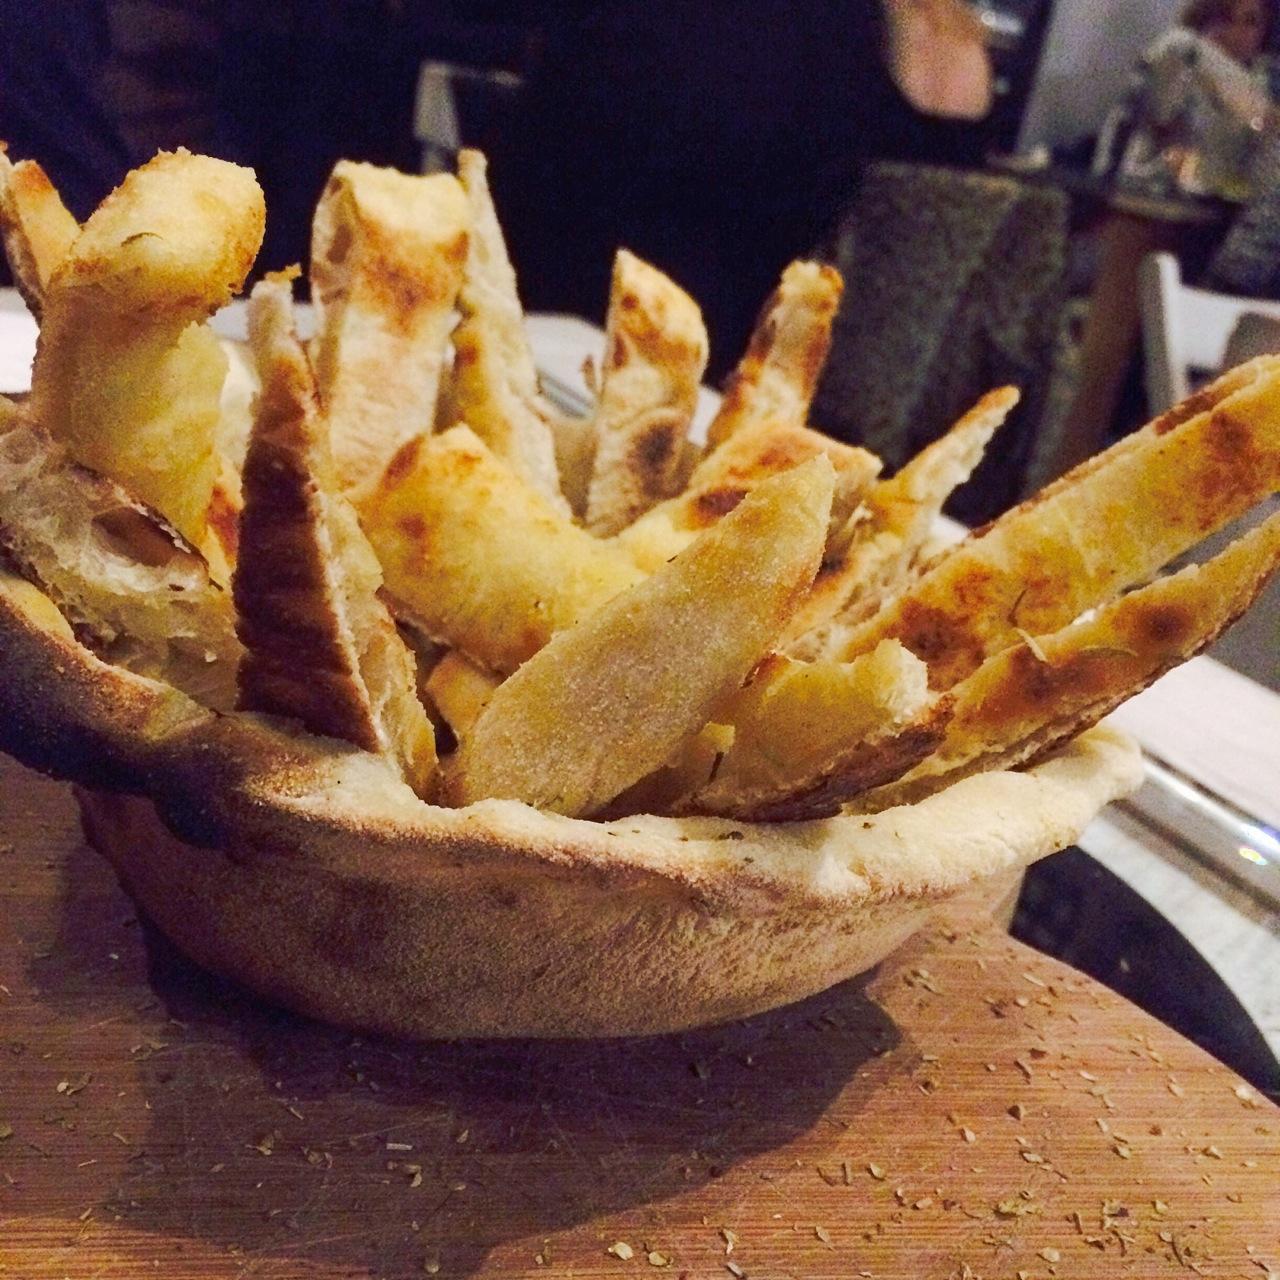 https://i0.wp.com/fatgayvegan.com/wp-content/uploads/2015/11/Vegan-bread-basket.jpg?fit=1280%2C1280